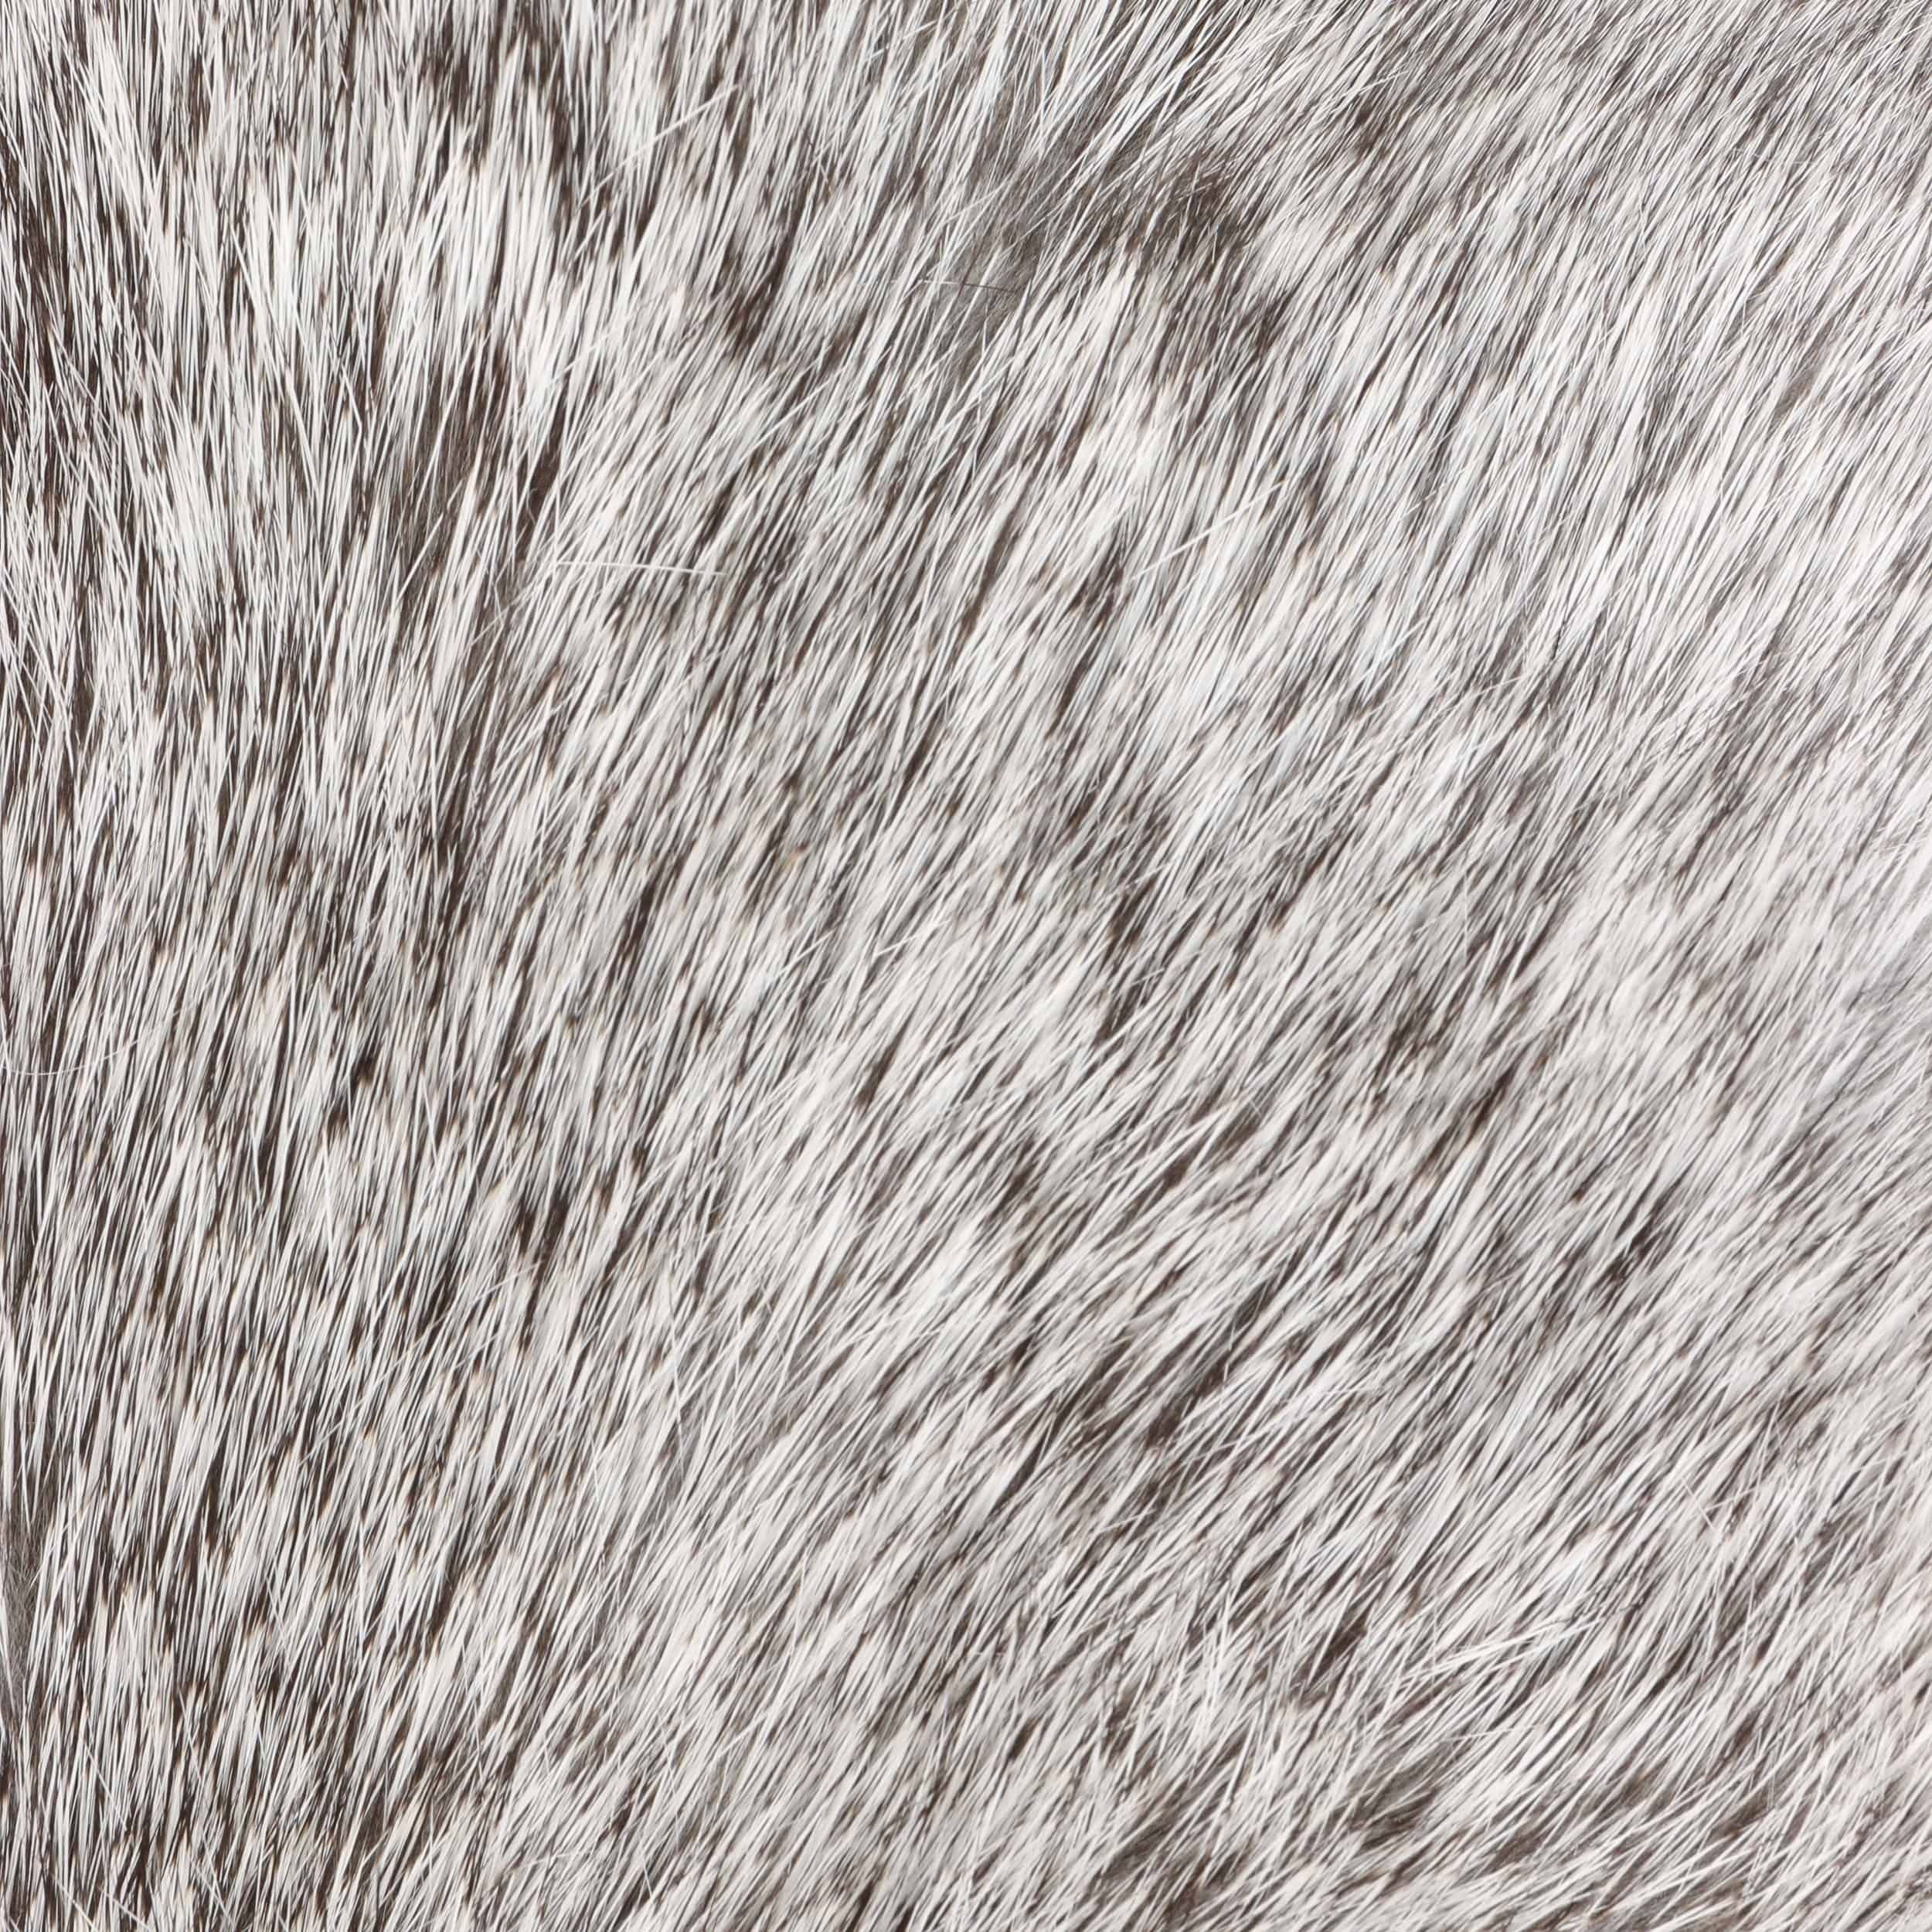 Hatfield Lapeer grau